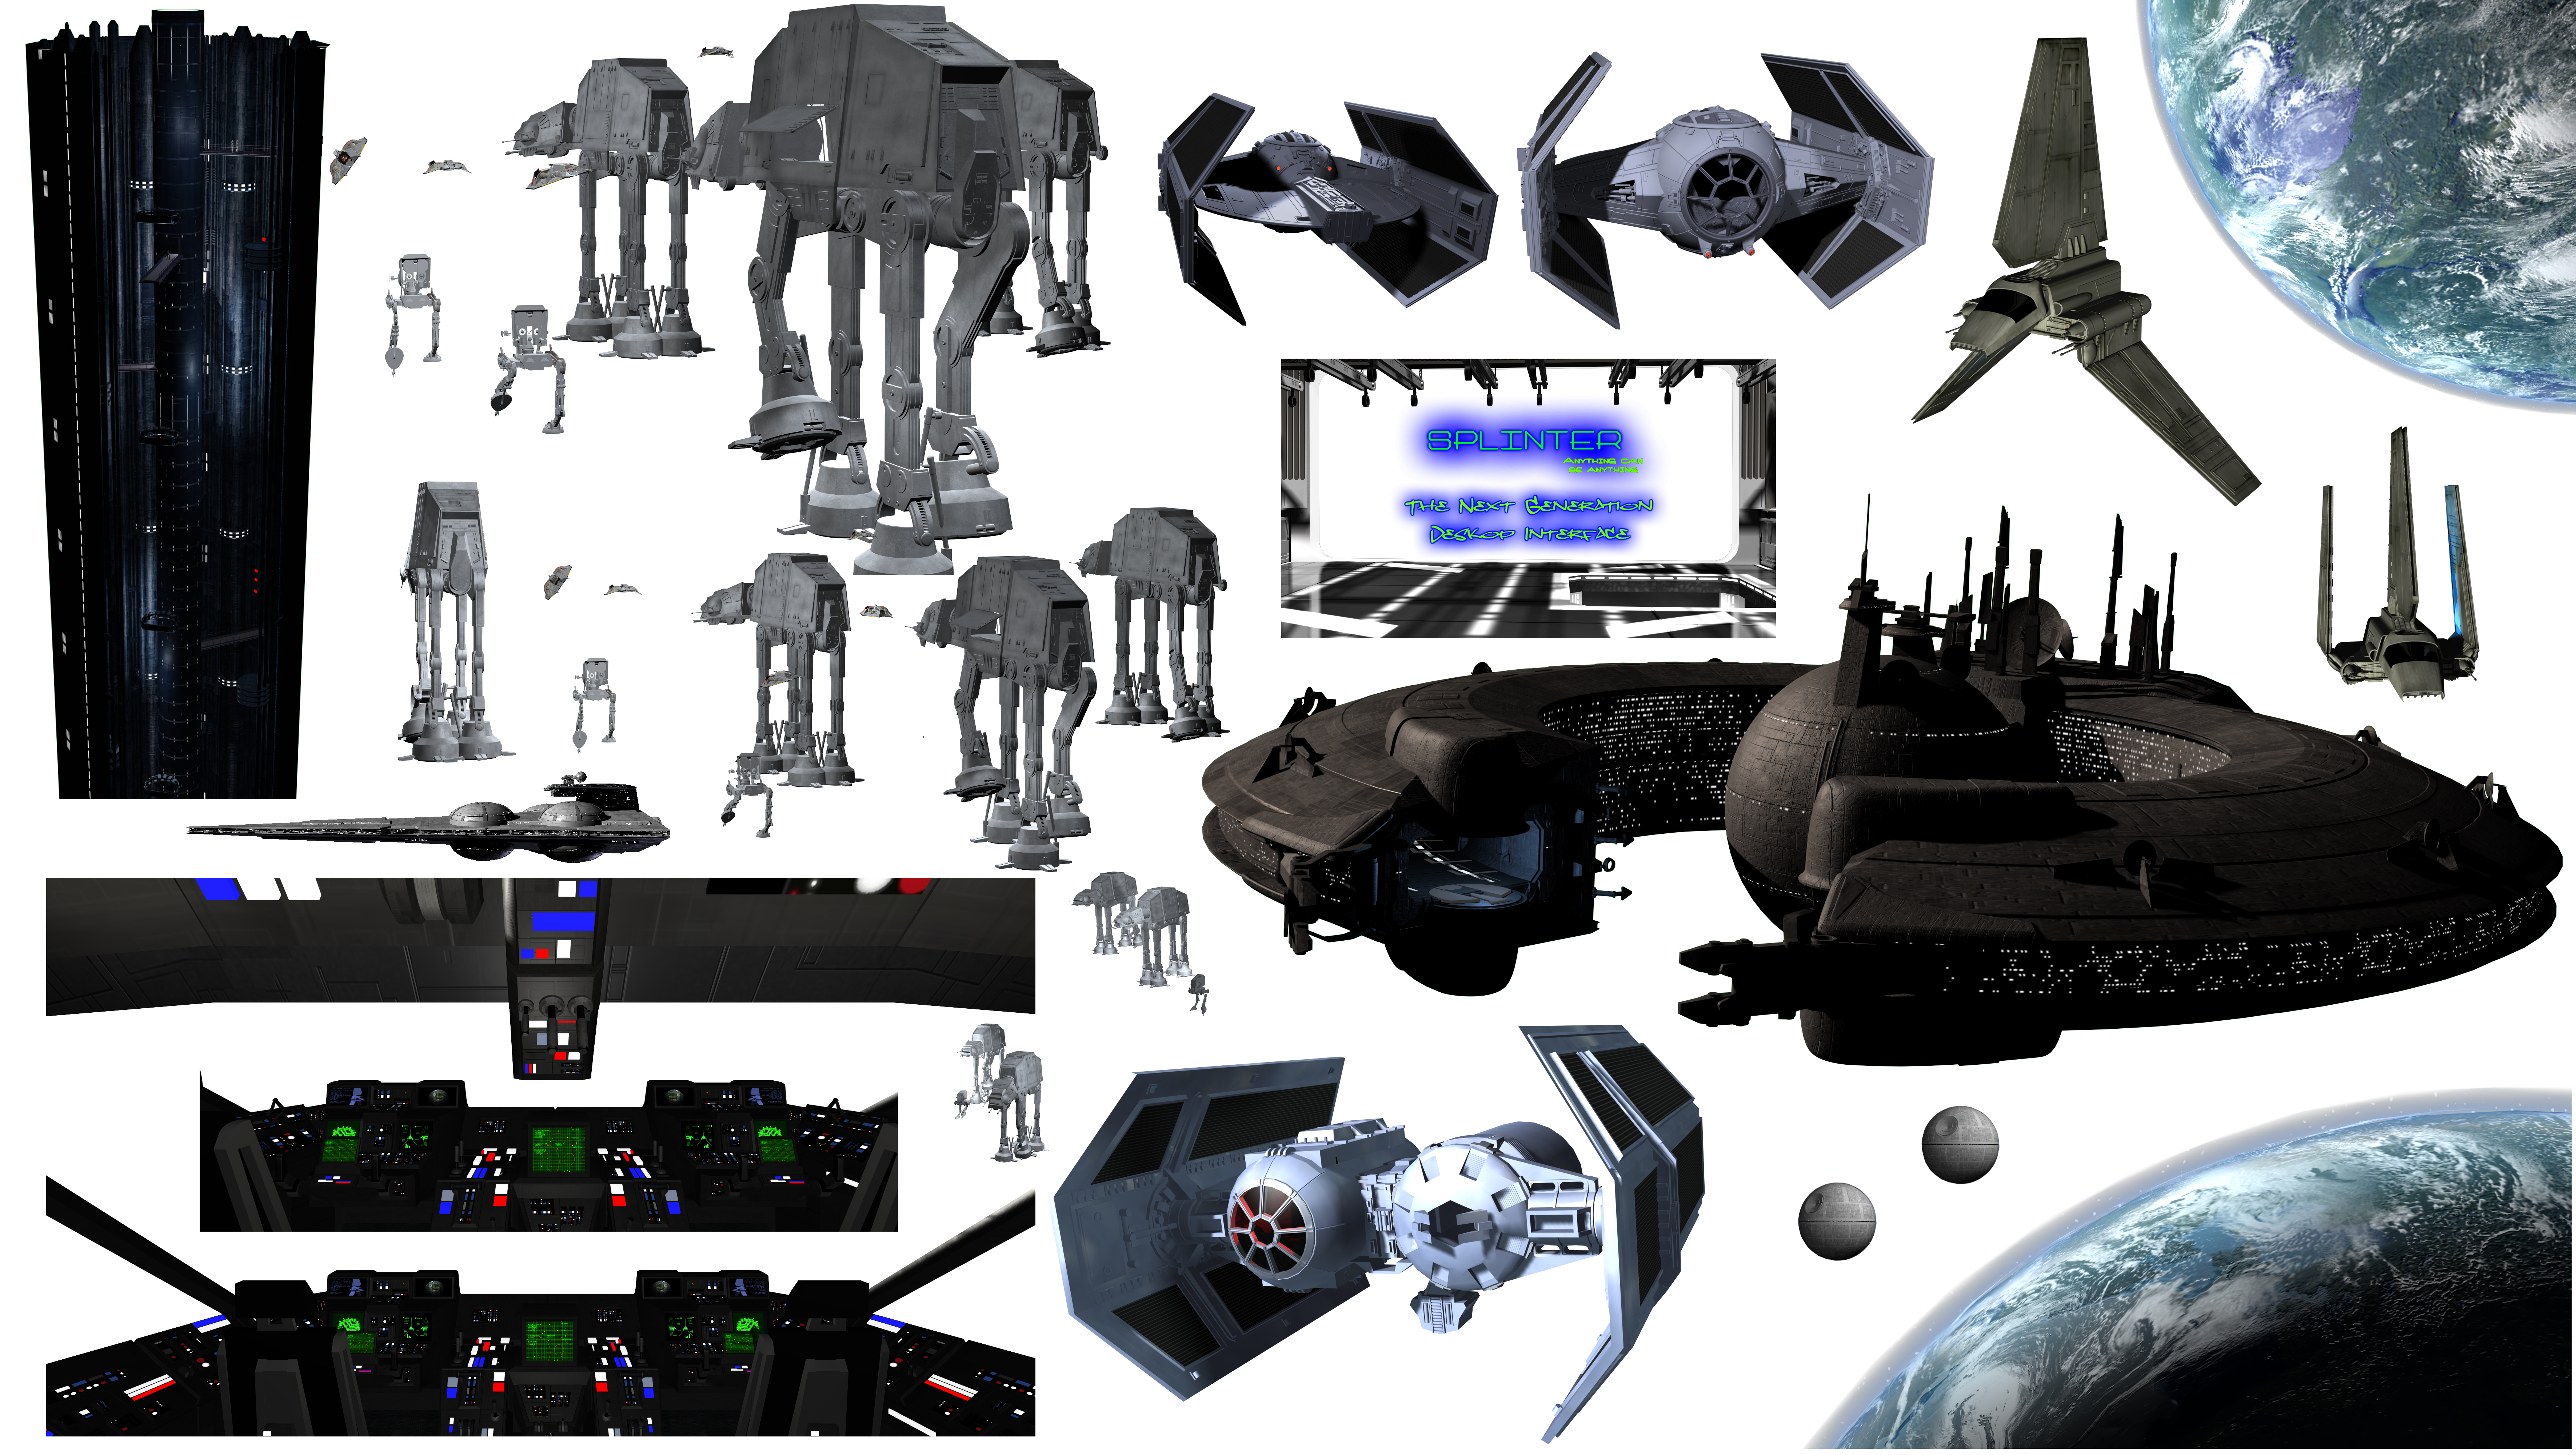 Splinter Stock - Star Wars Ships 7083x4000